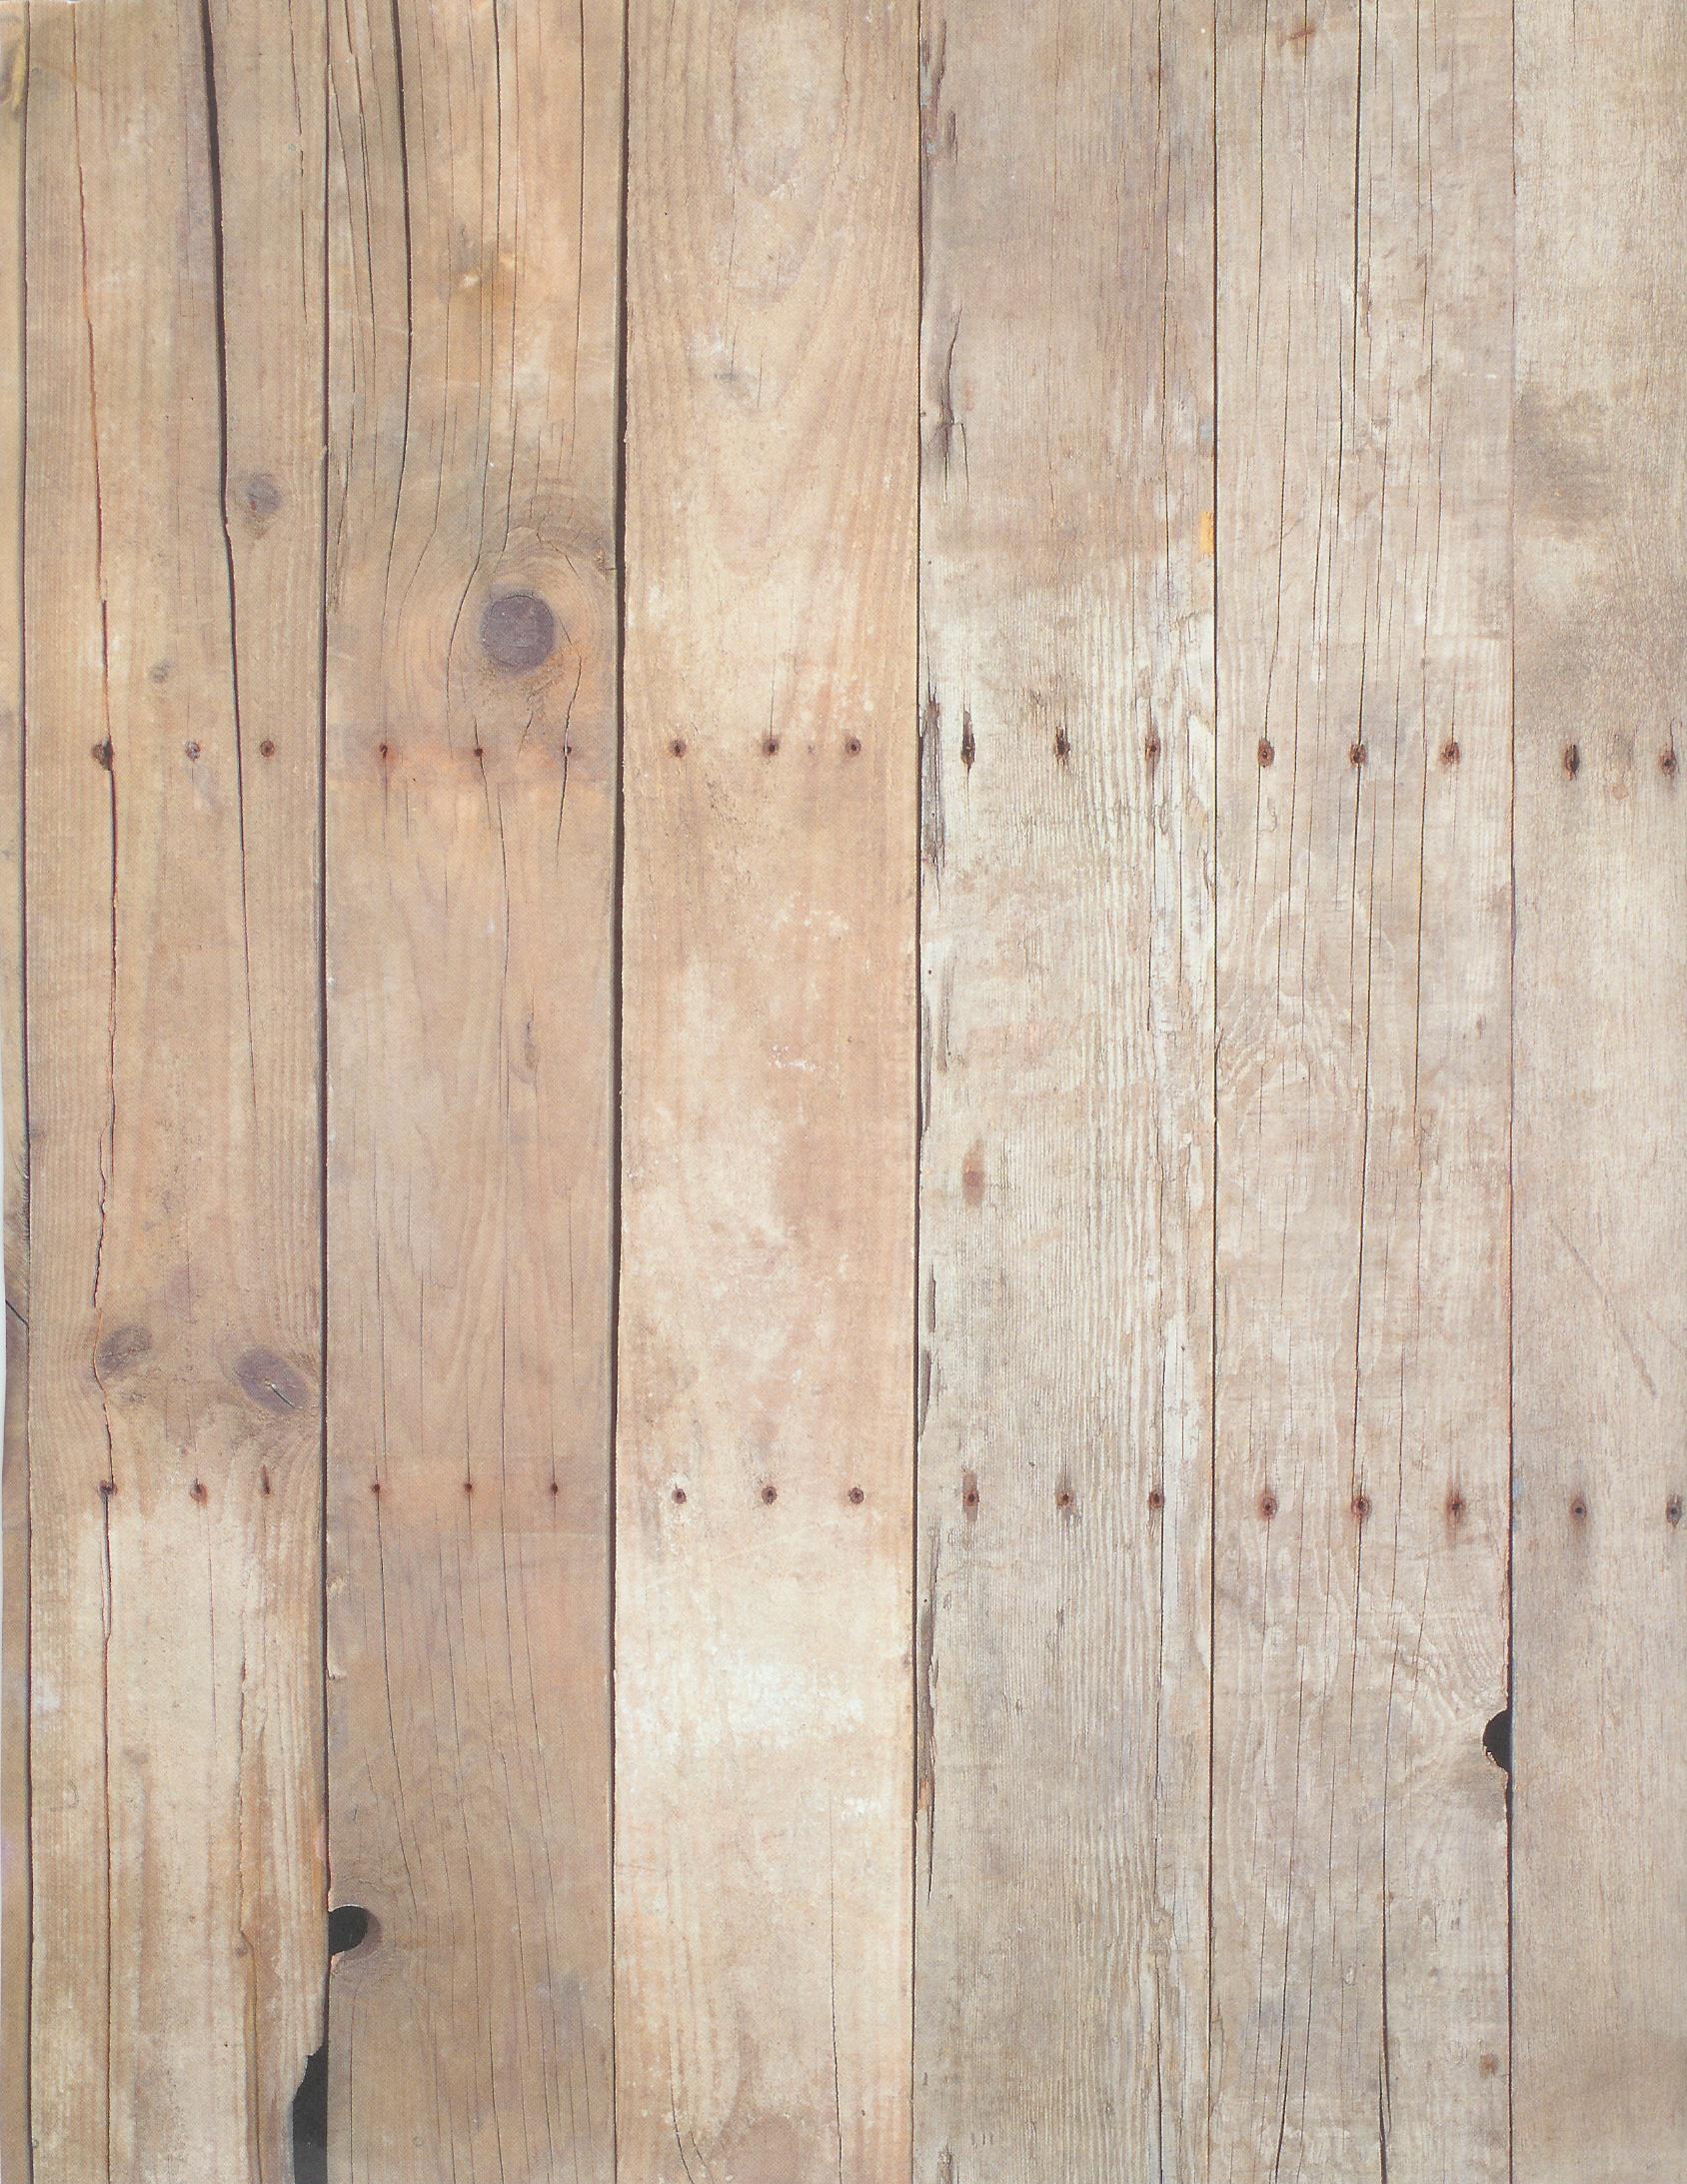 Wood by Breyer-Stock